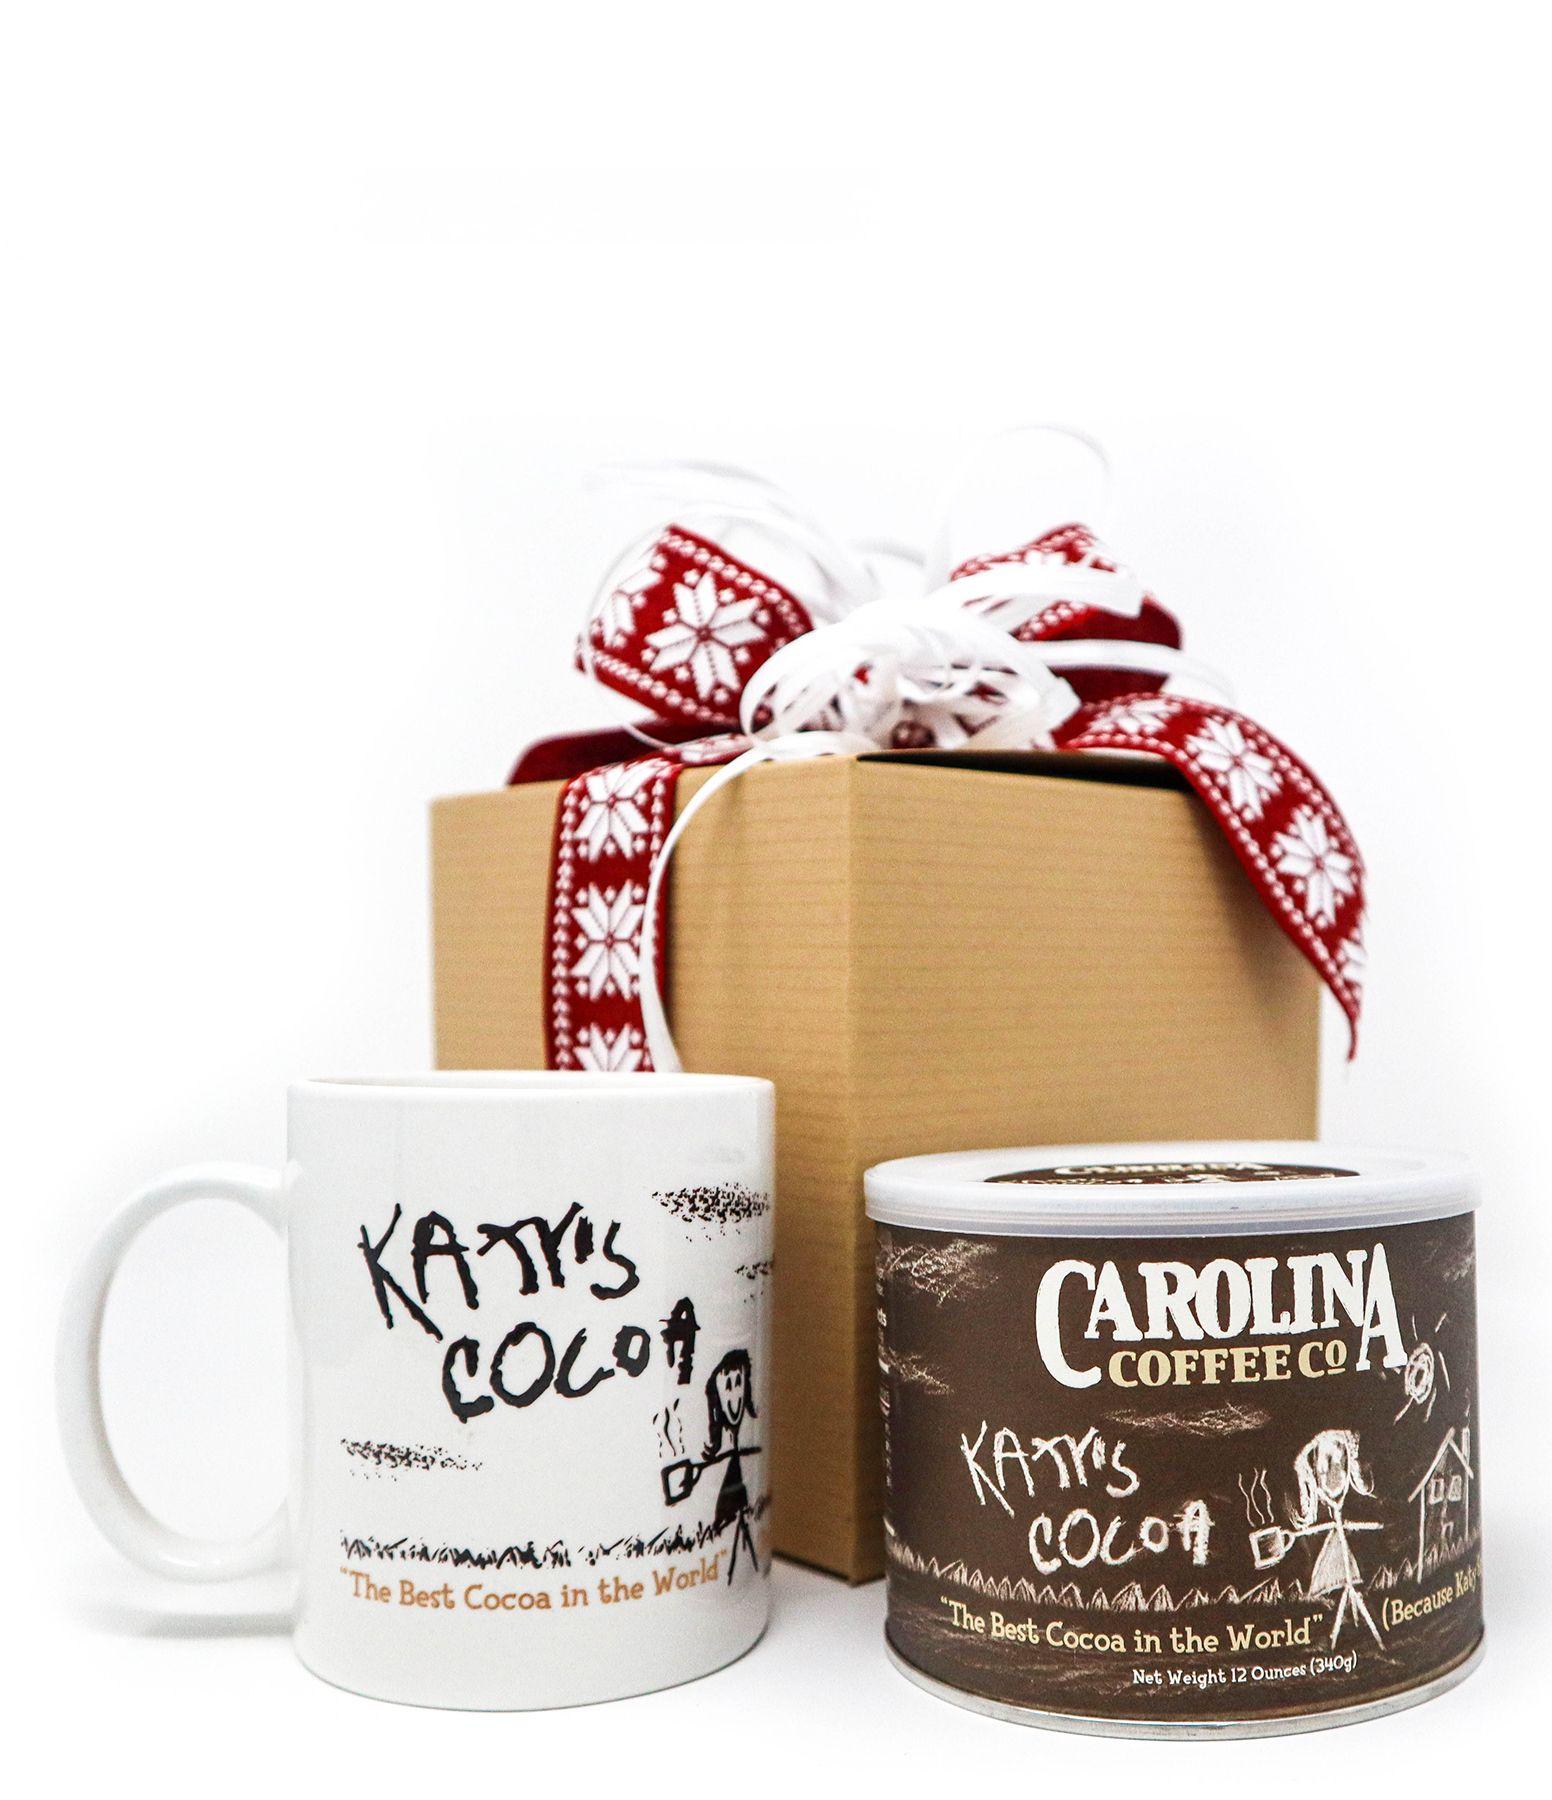 Carolina Coffee Katy's Cocoa and Mug